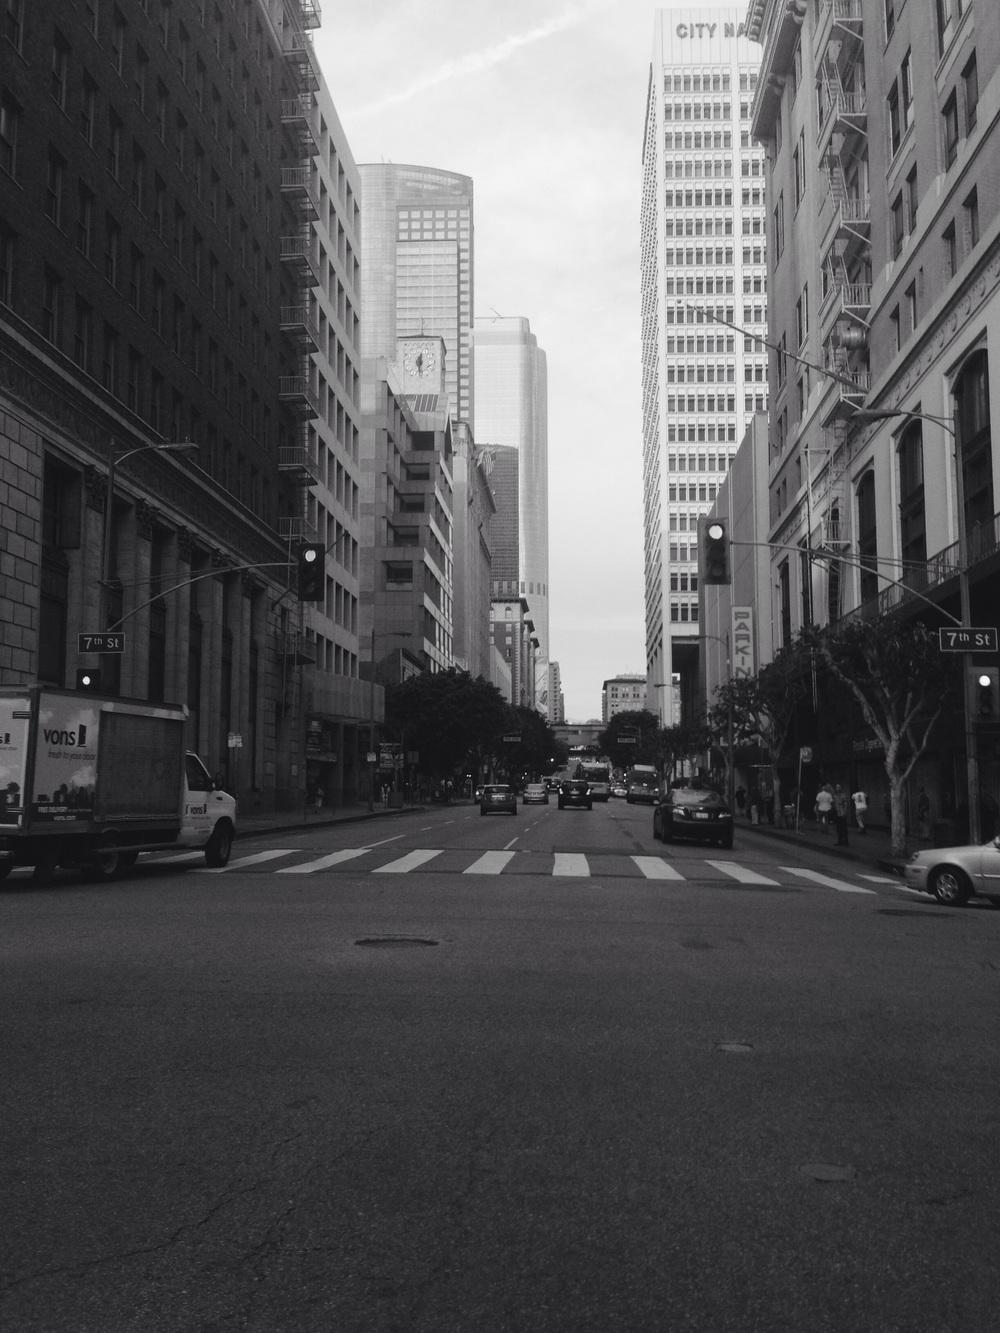 DowntownLA.jpg